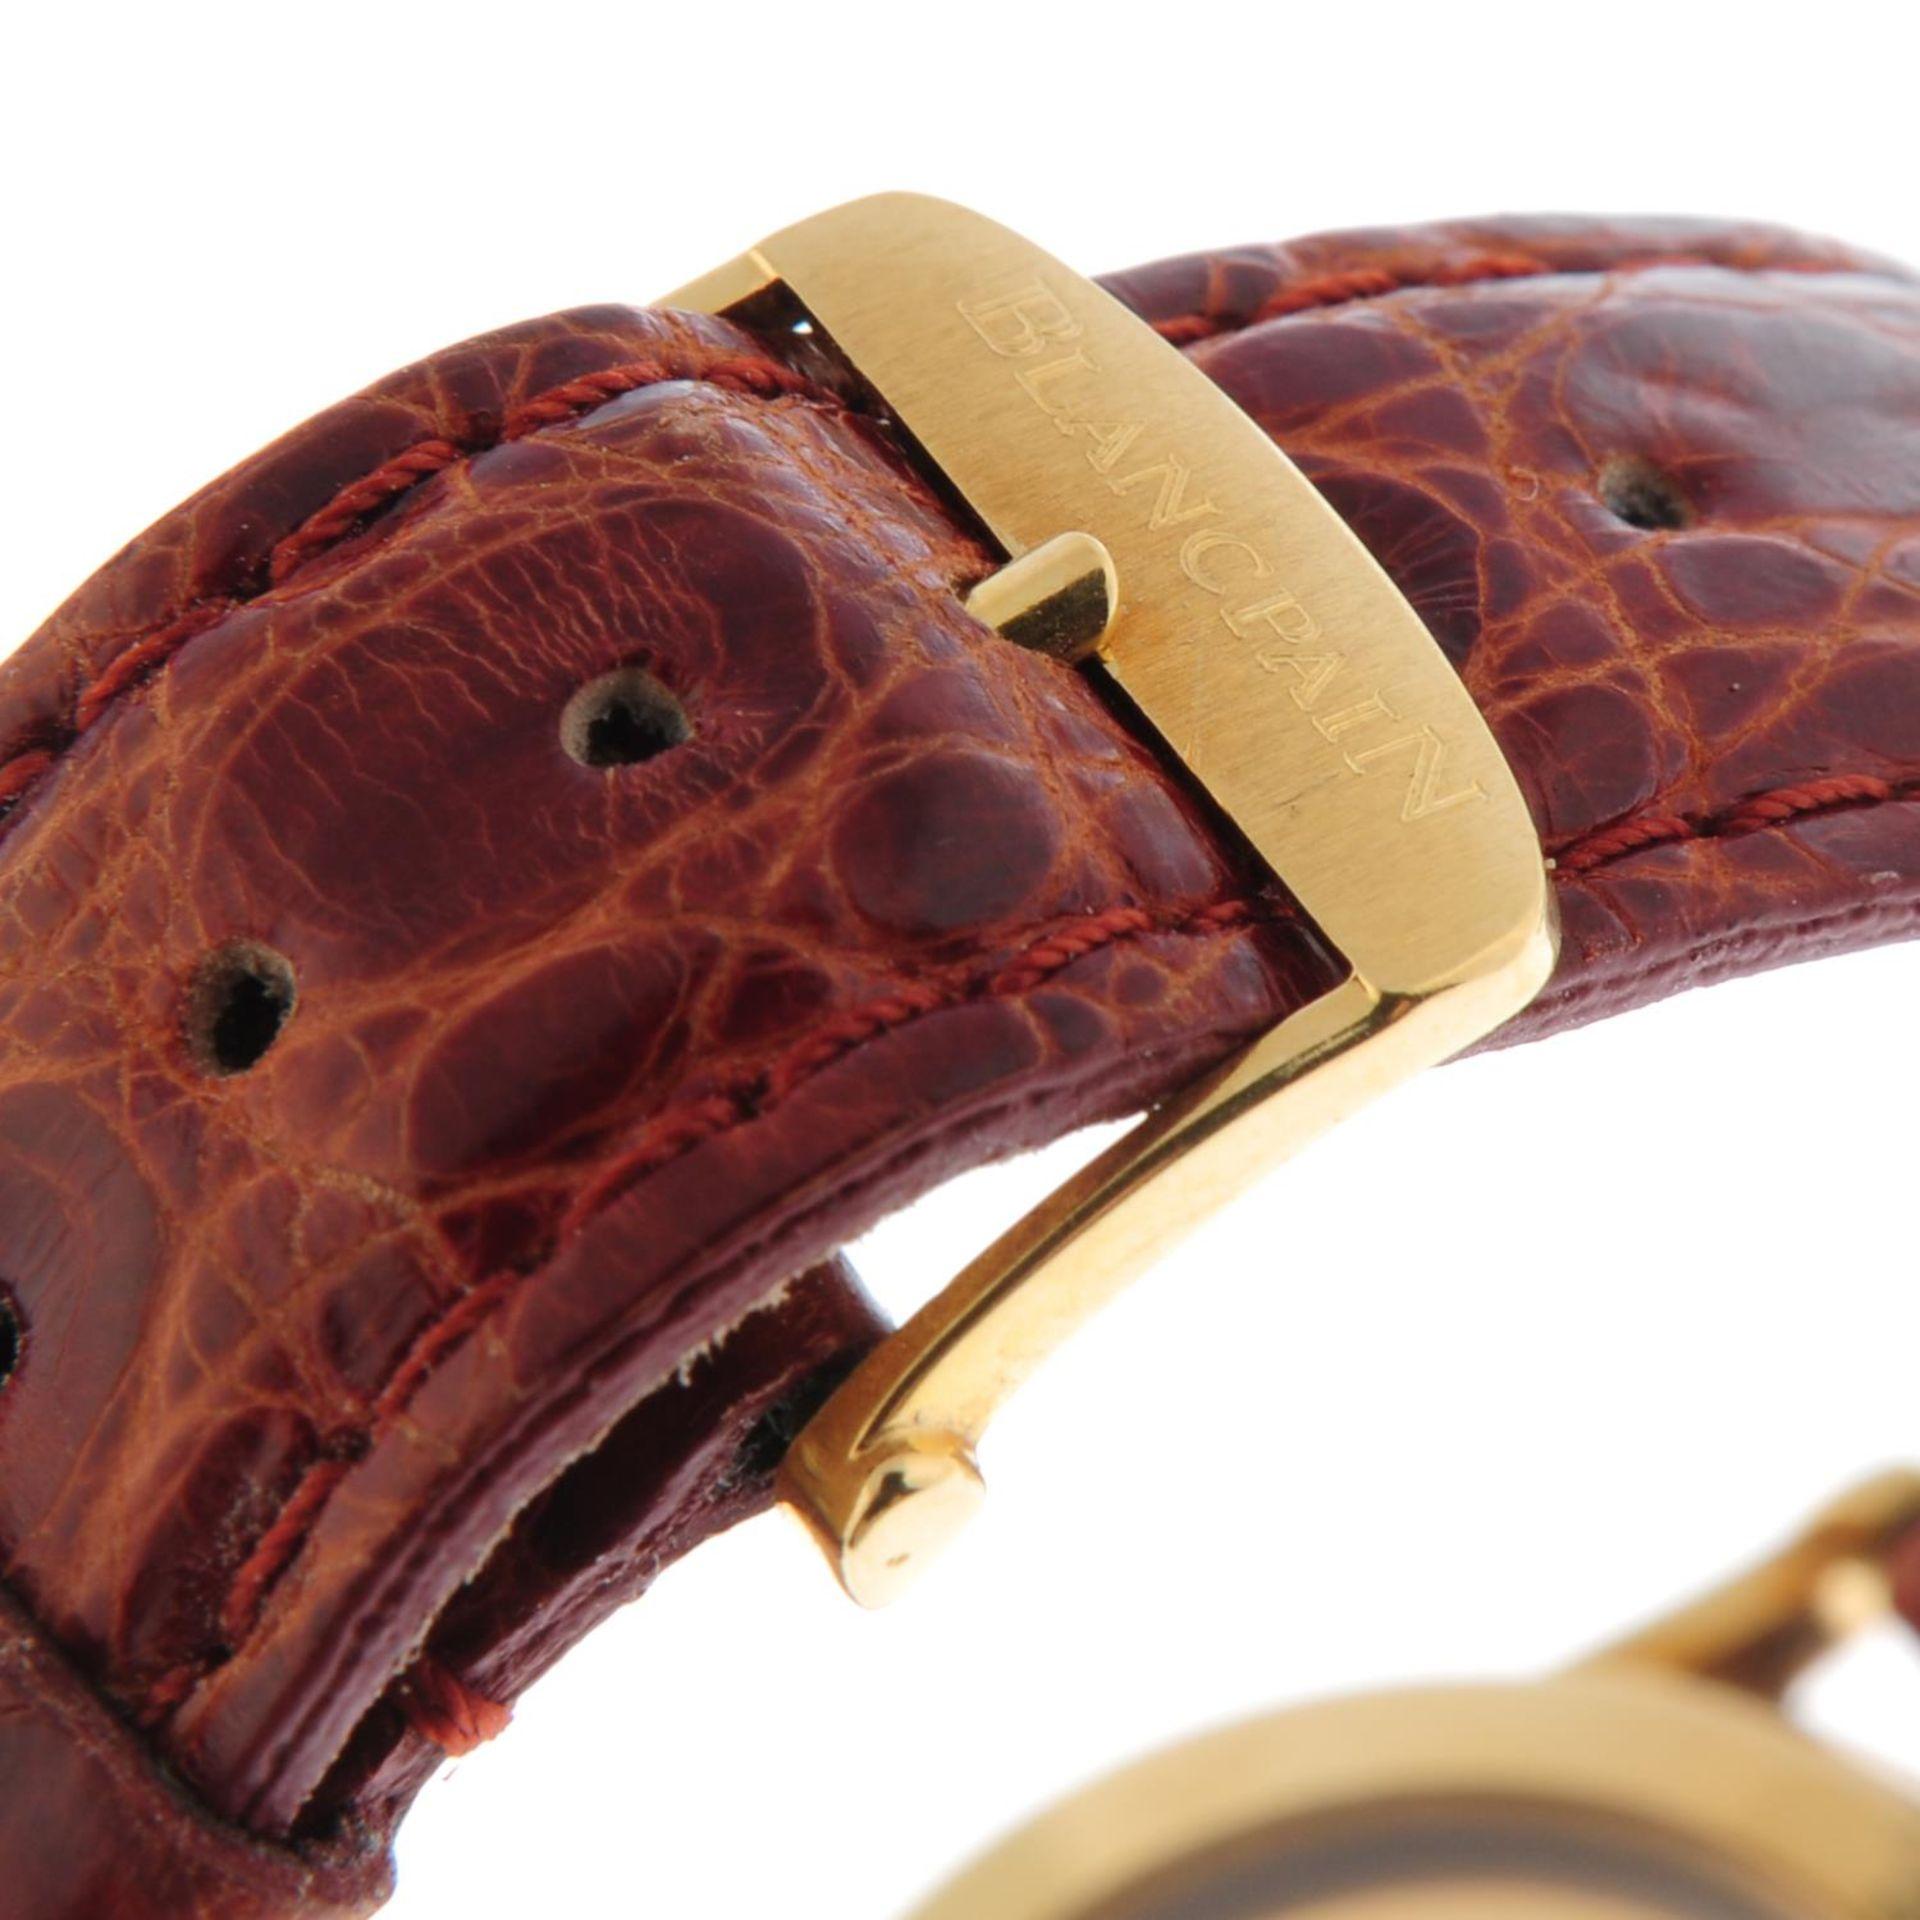 BLANCPAIN - a Villeret wrist watch. - Bild 4 aus 6